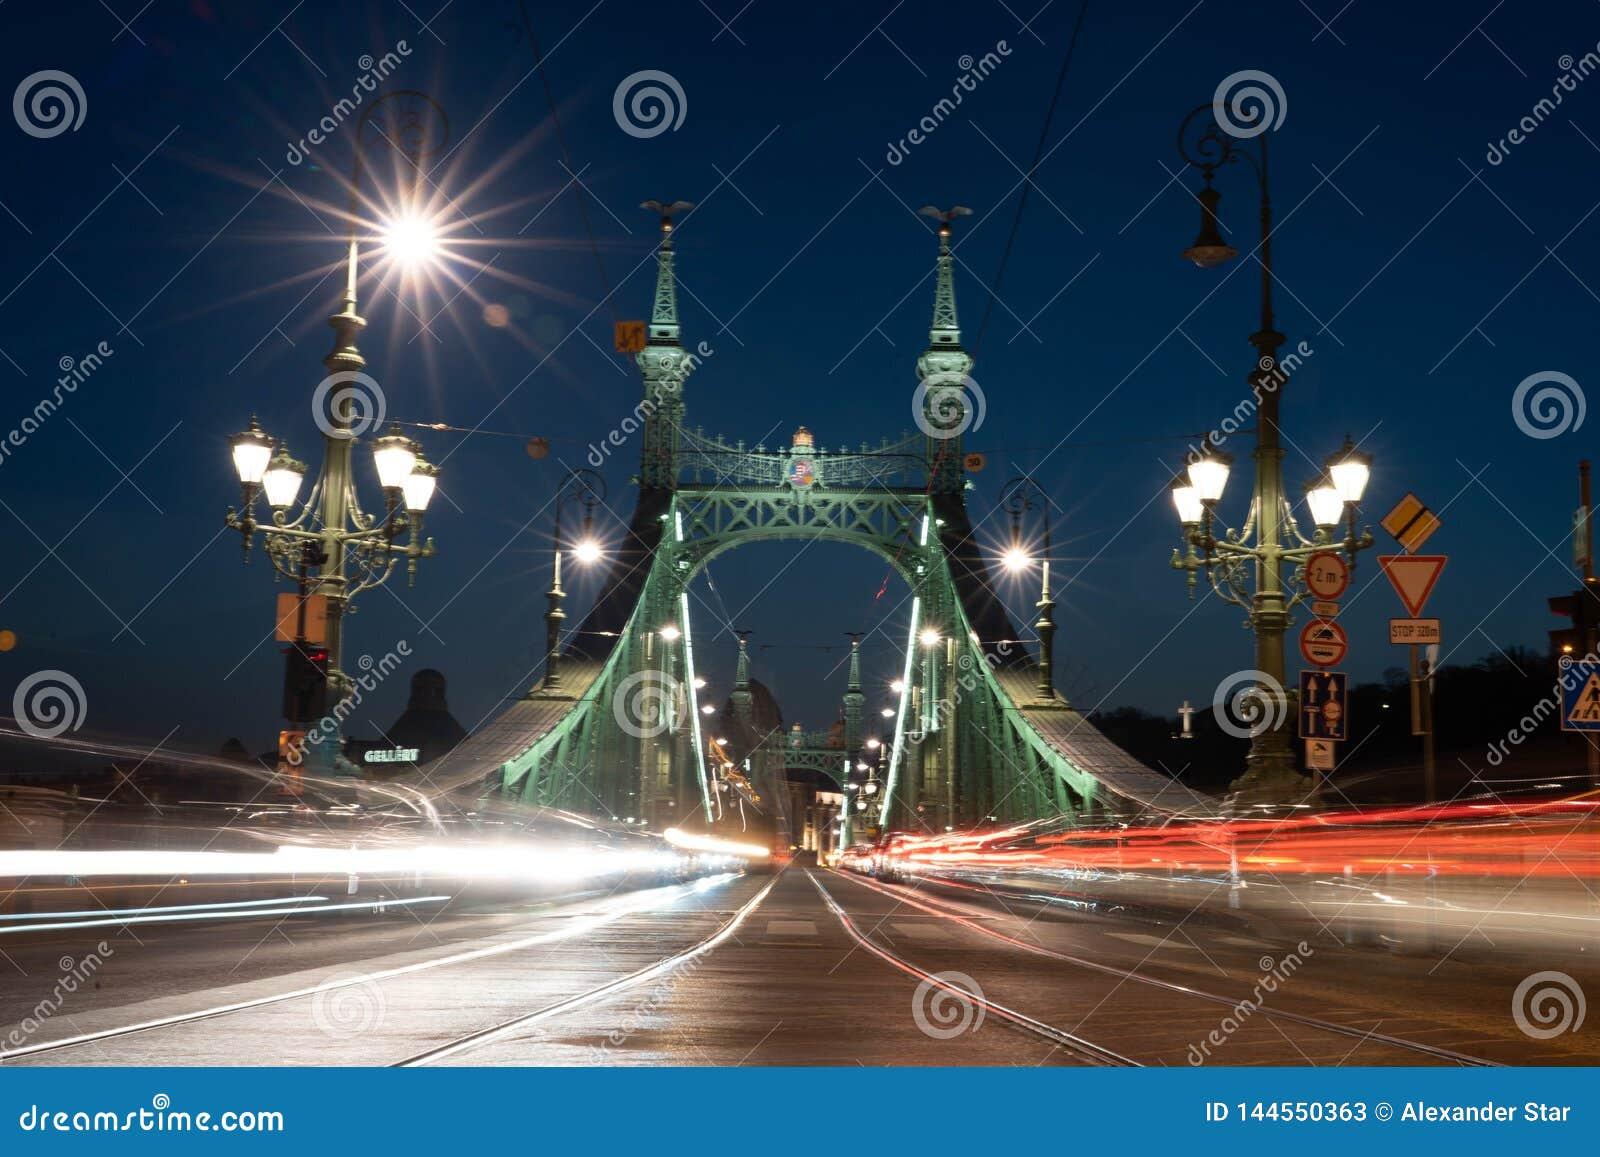 Budapest Bridge liberty bridge cars light trails